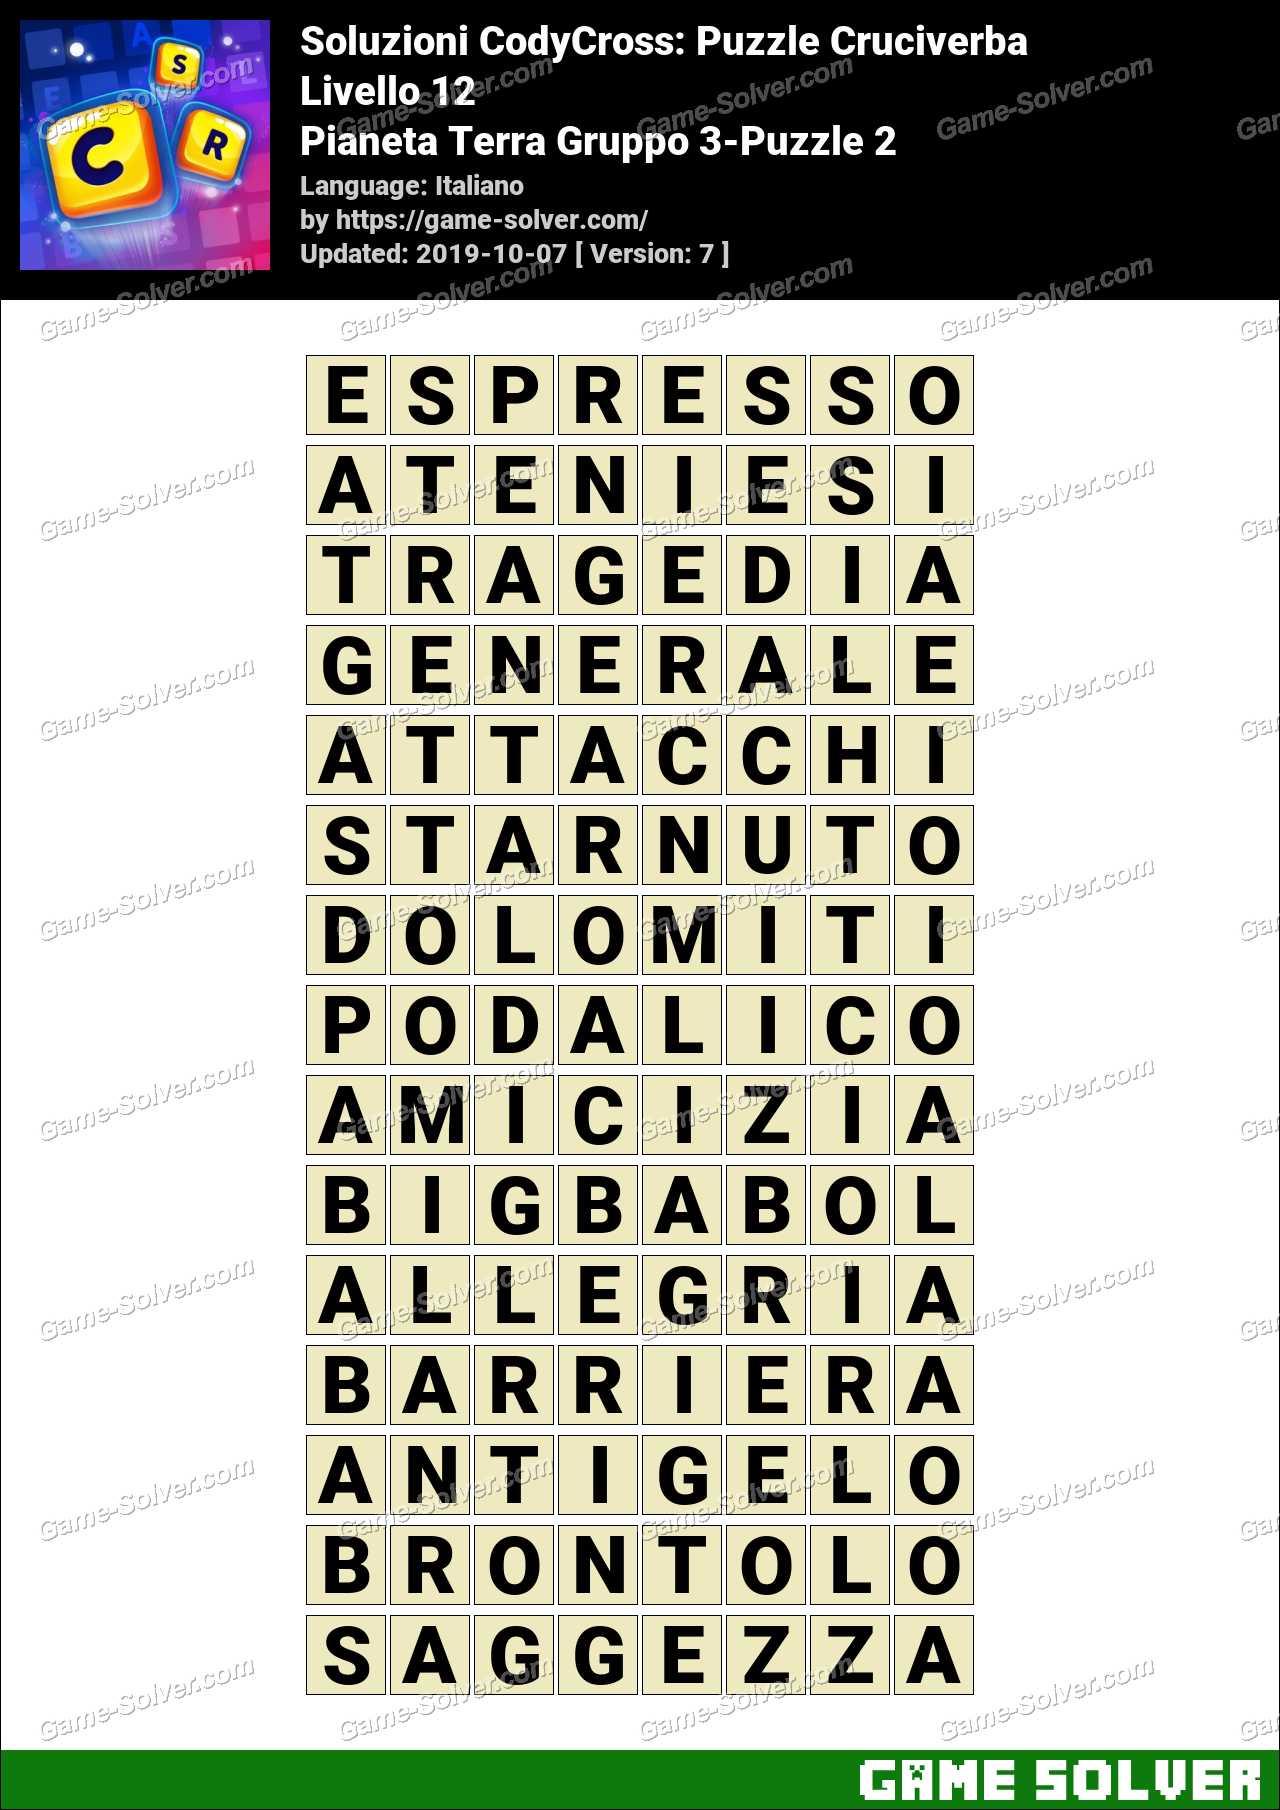 Soluzioni CodyCross Pianeta Terra Gruppo 3-Puzzle 2